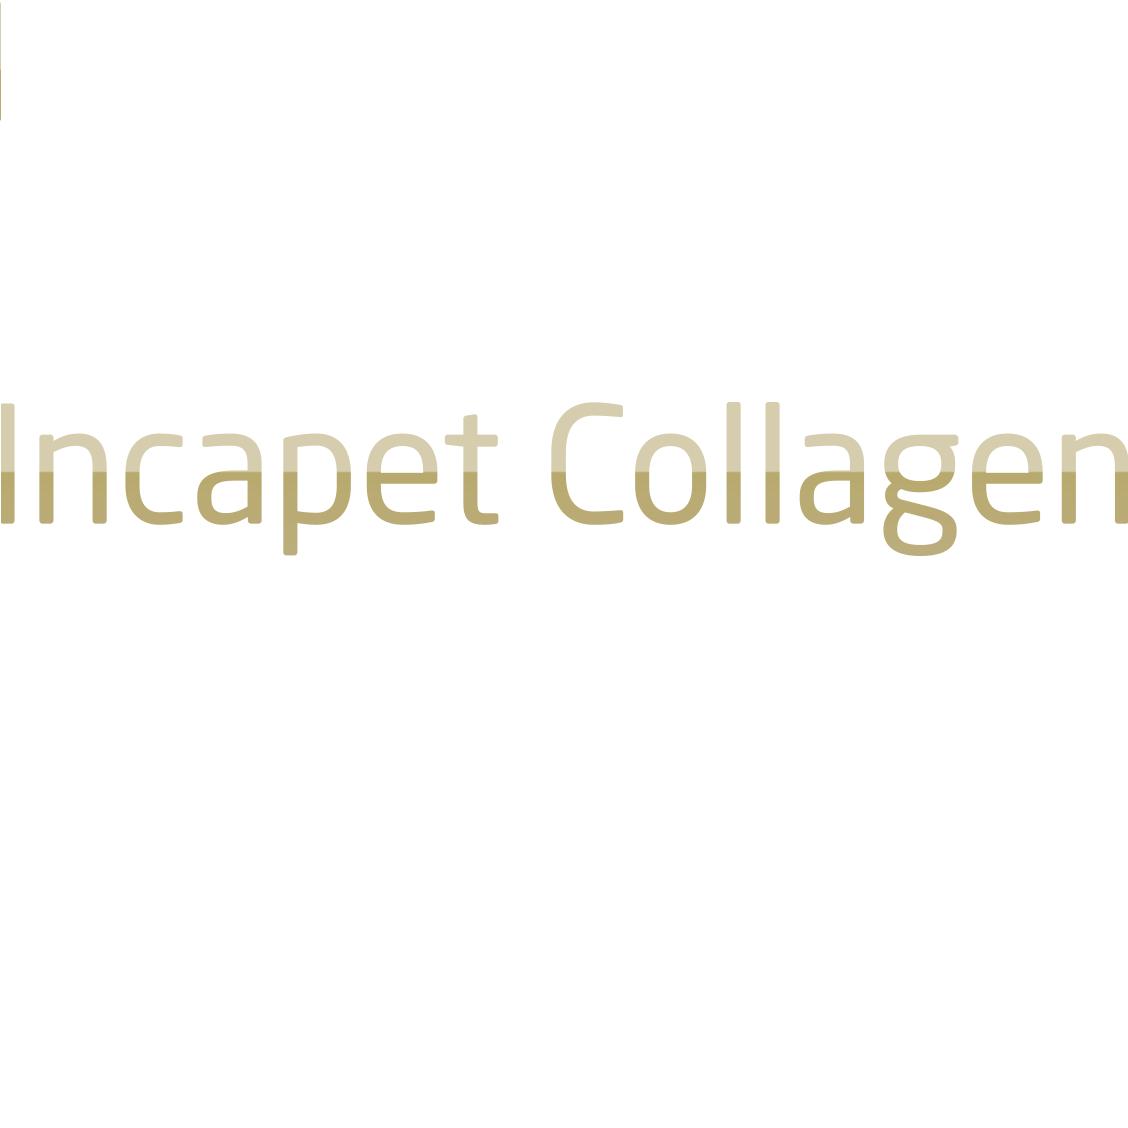 Incapetcollagen.com – Zľava 5€